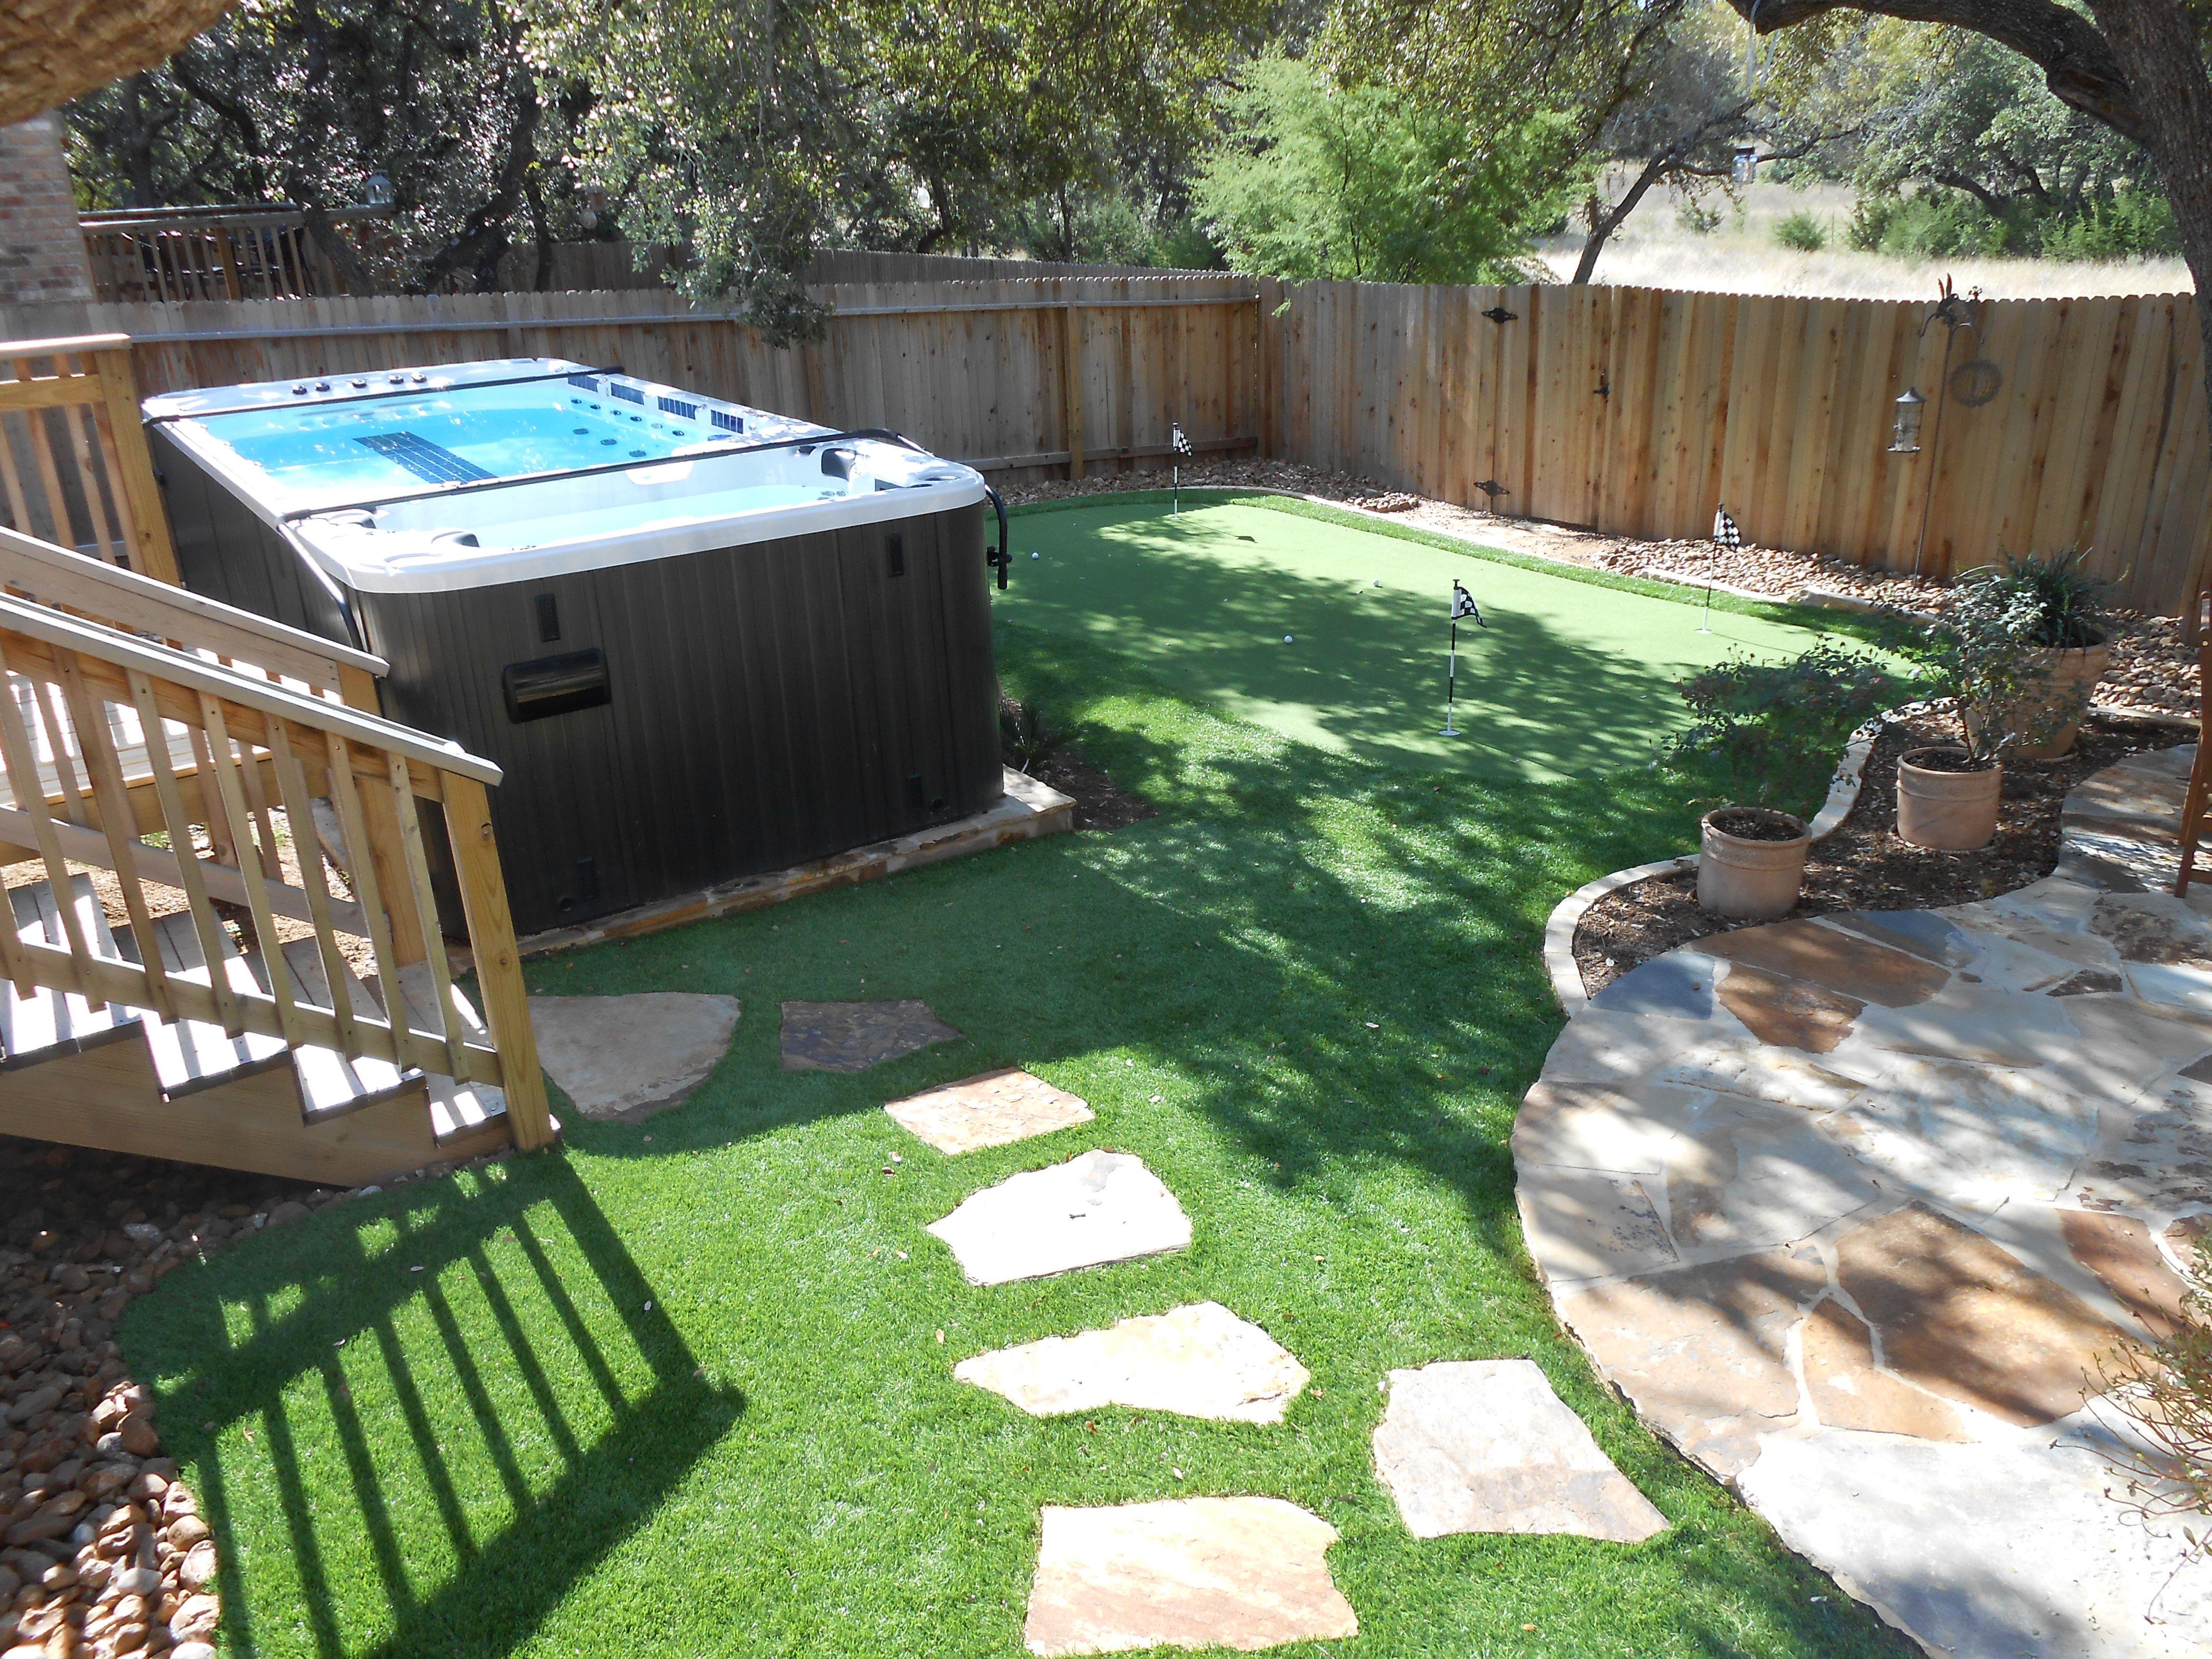 Above Ground Pool And Spa Company Blog Small Backyard Pools Swim Spa Small Inground Pool